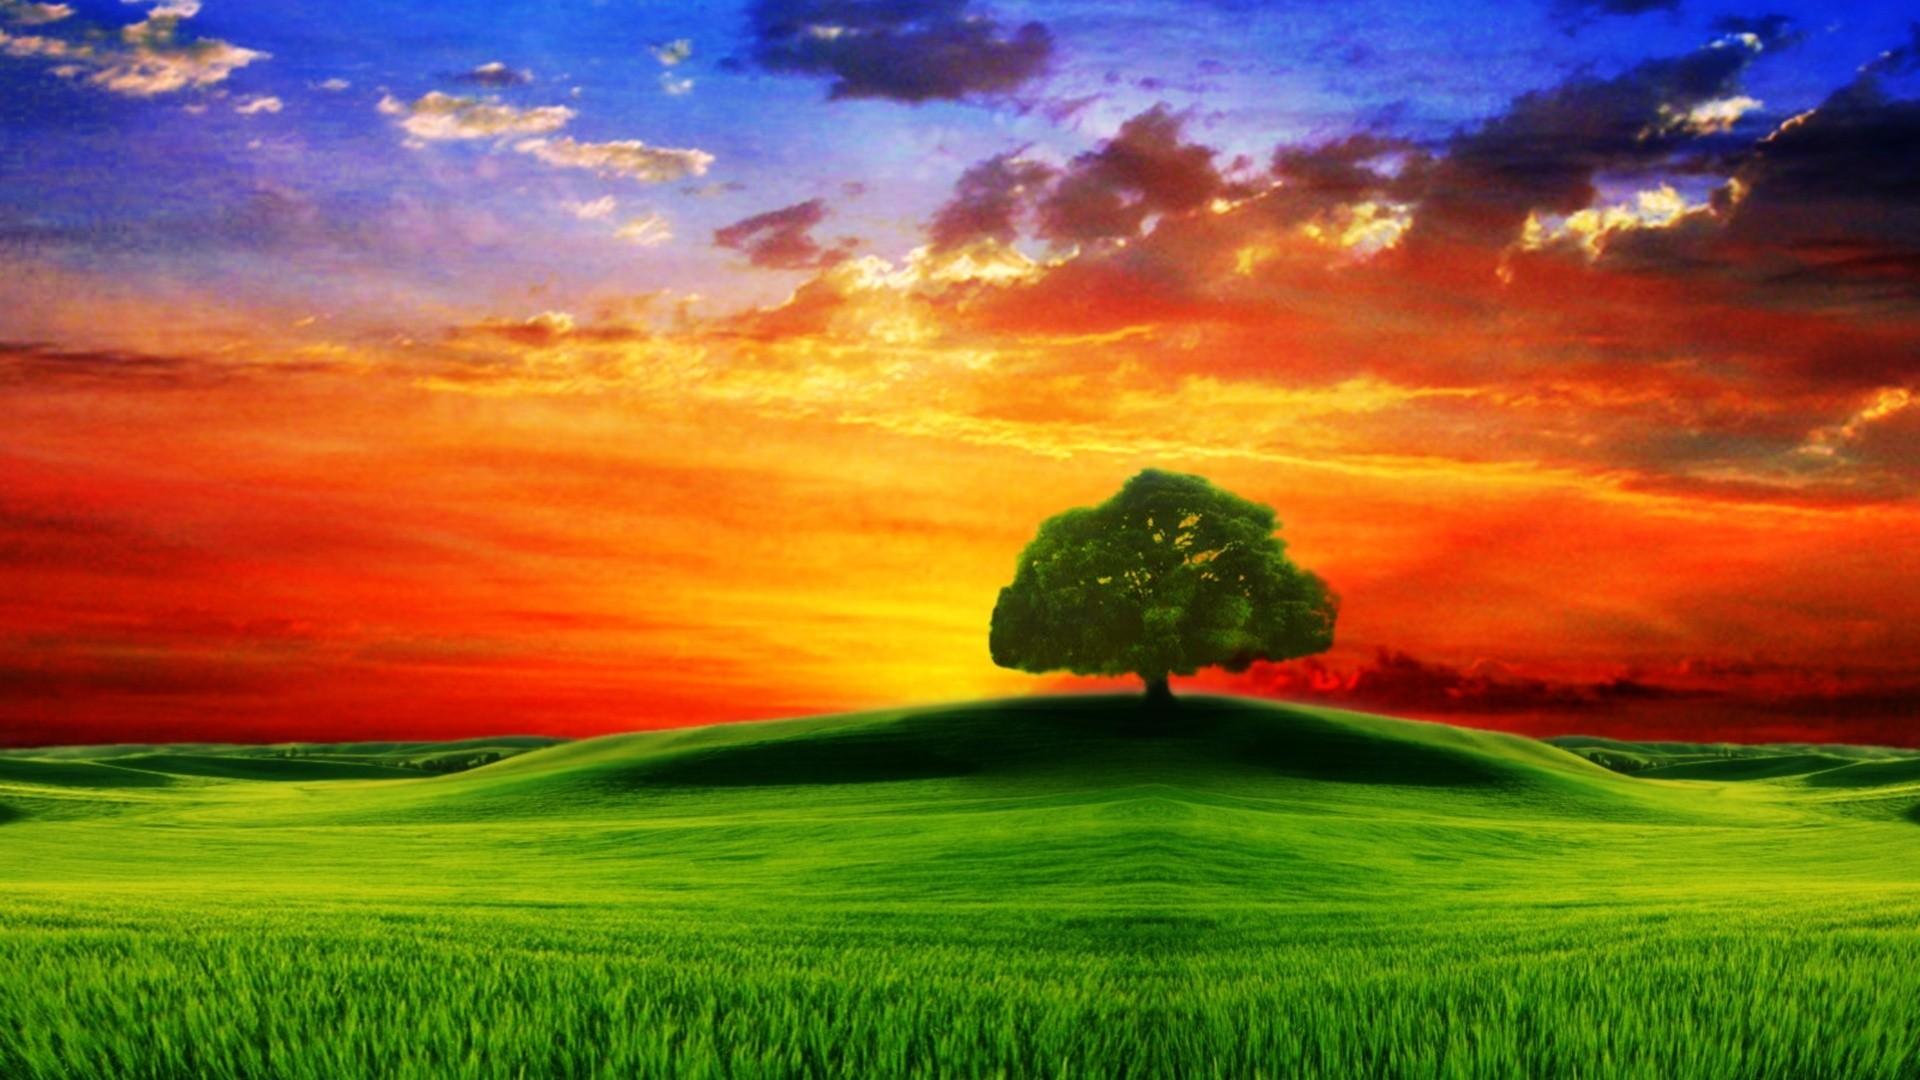 Beautiful Beach Sunset Wallpapers ImageBankbiz 1920x1080